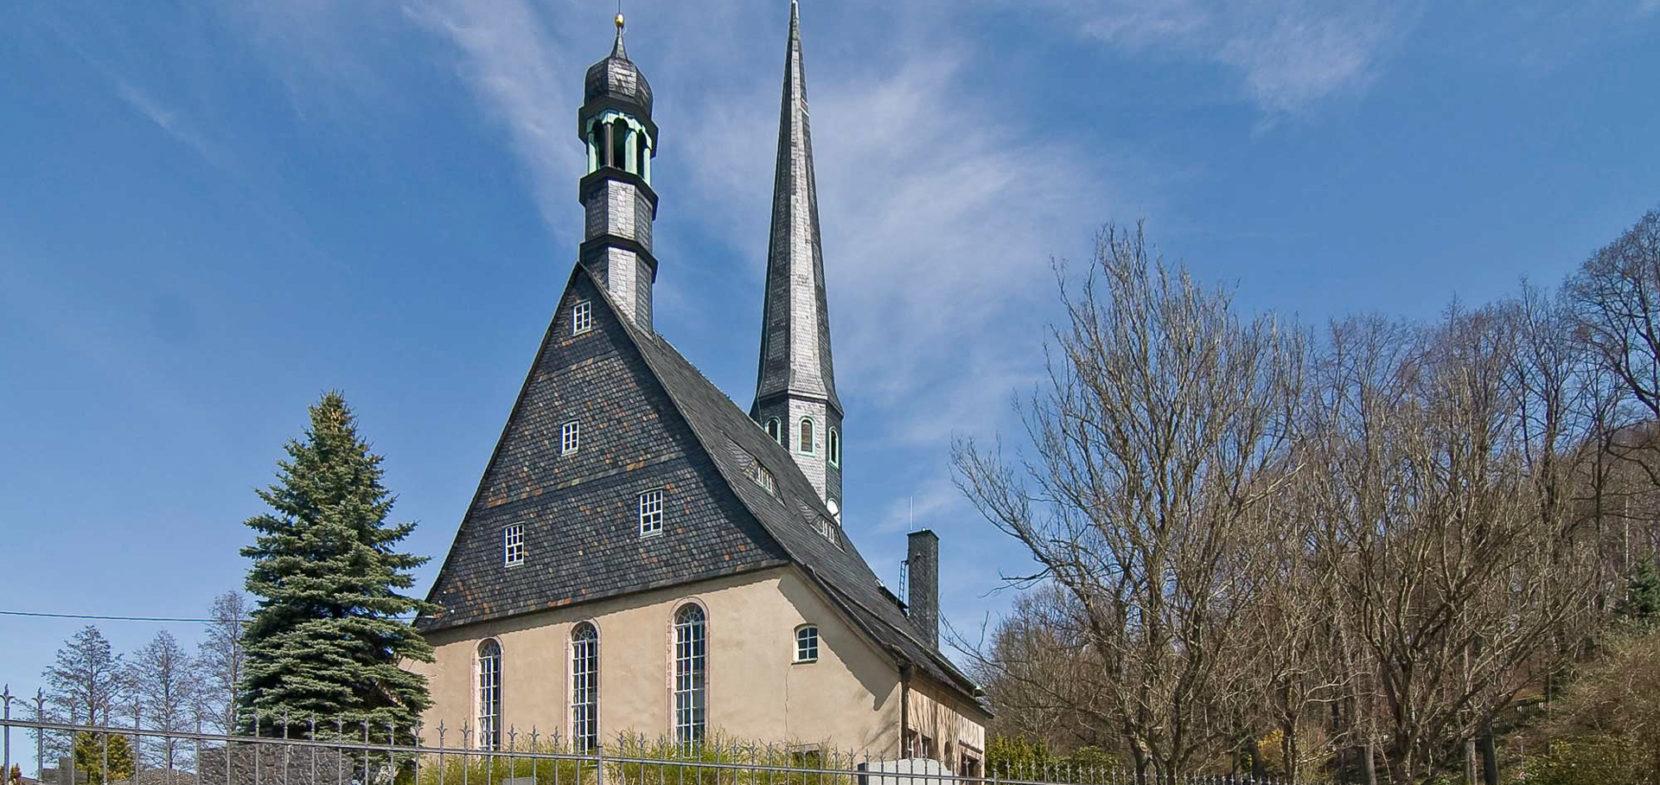 Kirche St. Nicolai in Mülsen St. Niclas